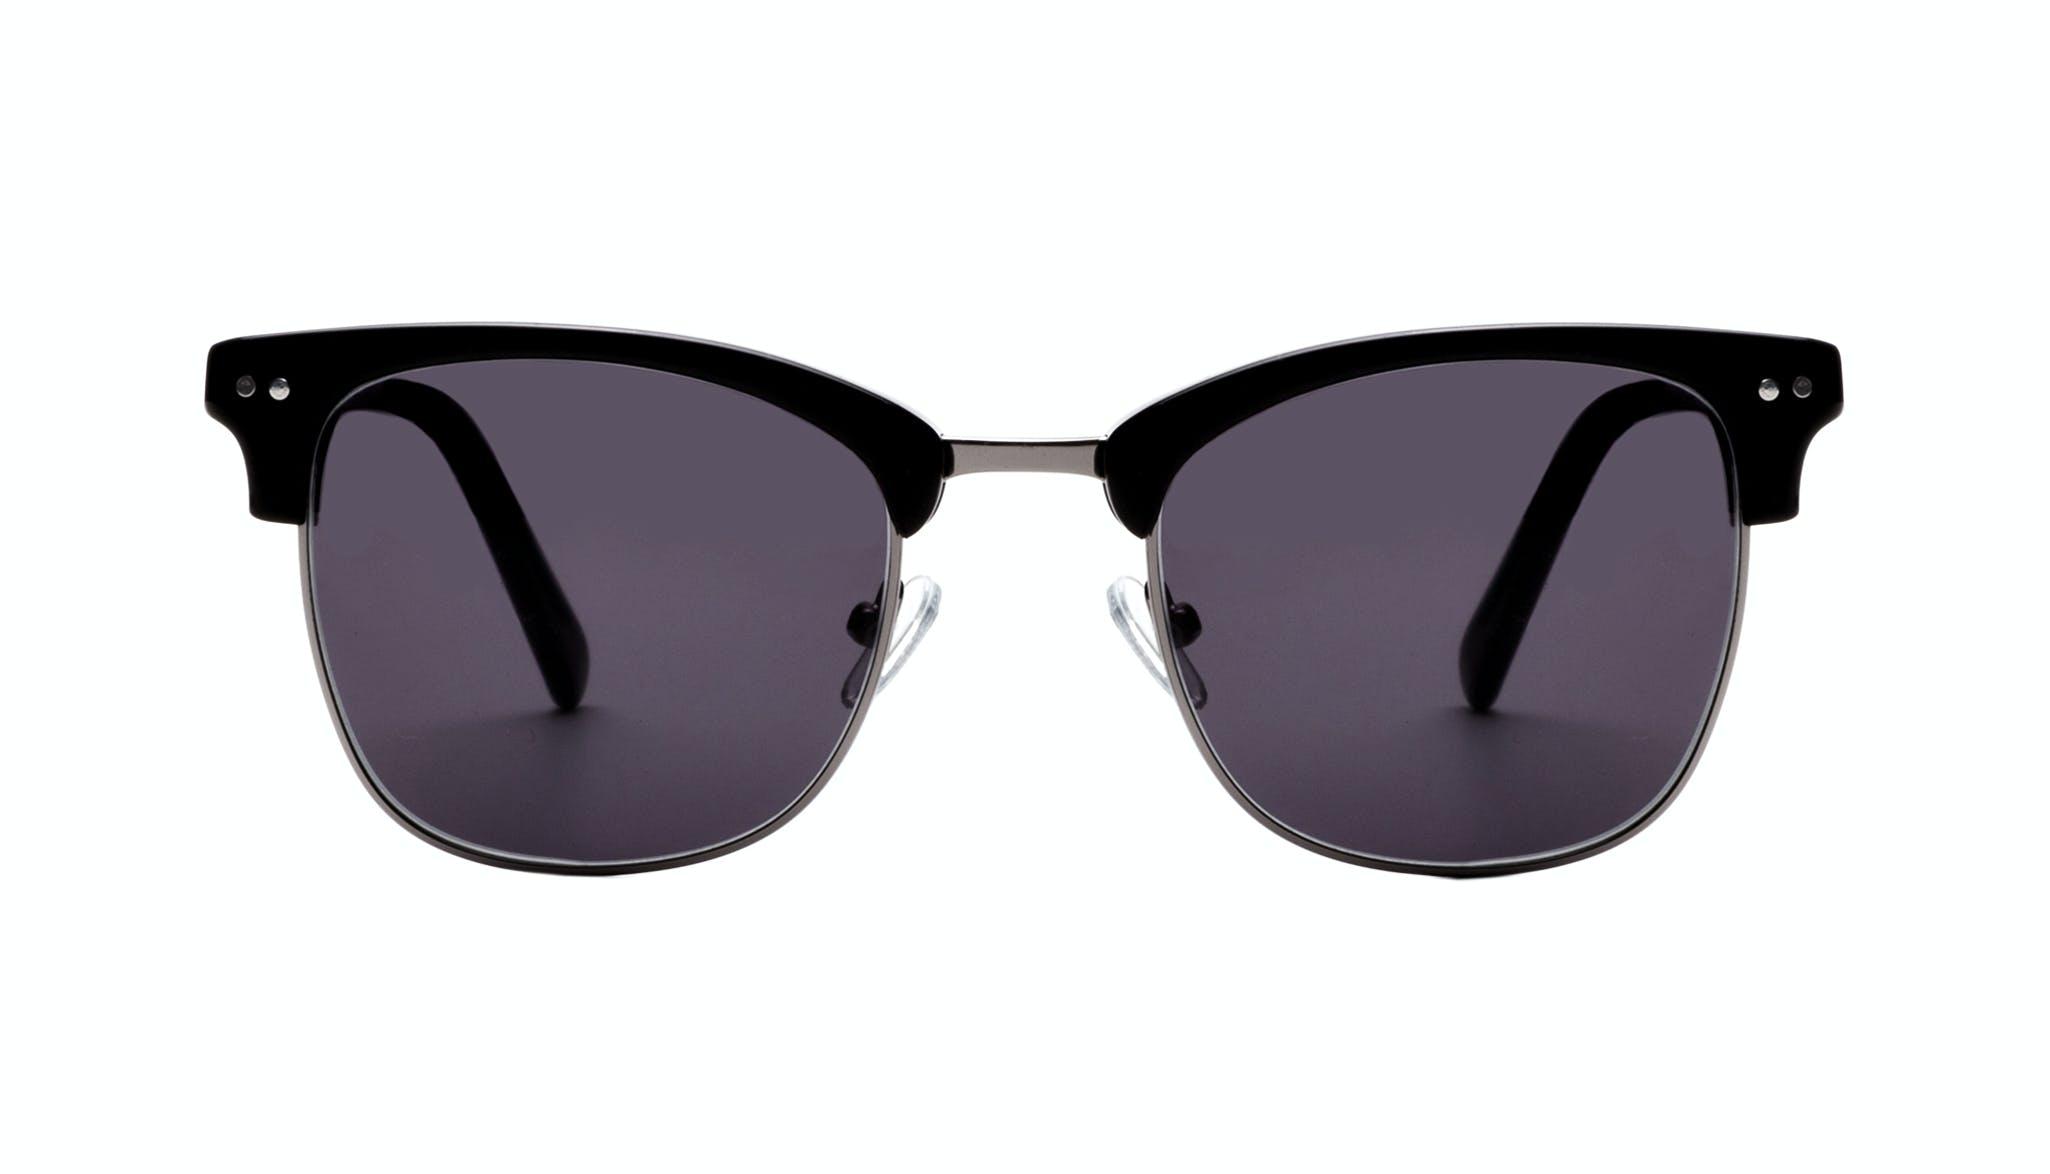 Affordable Fashion Glasses Square Sunglasses Men Lift Onyx Front